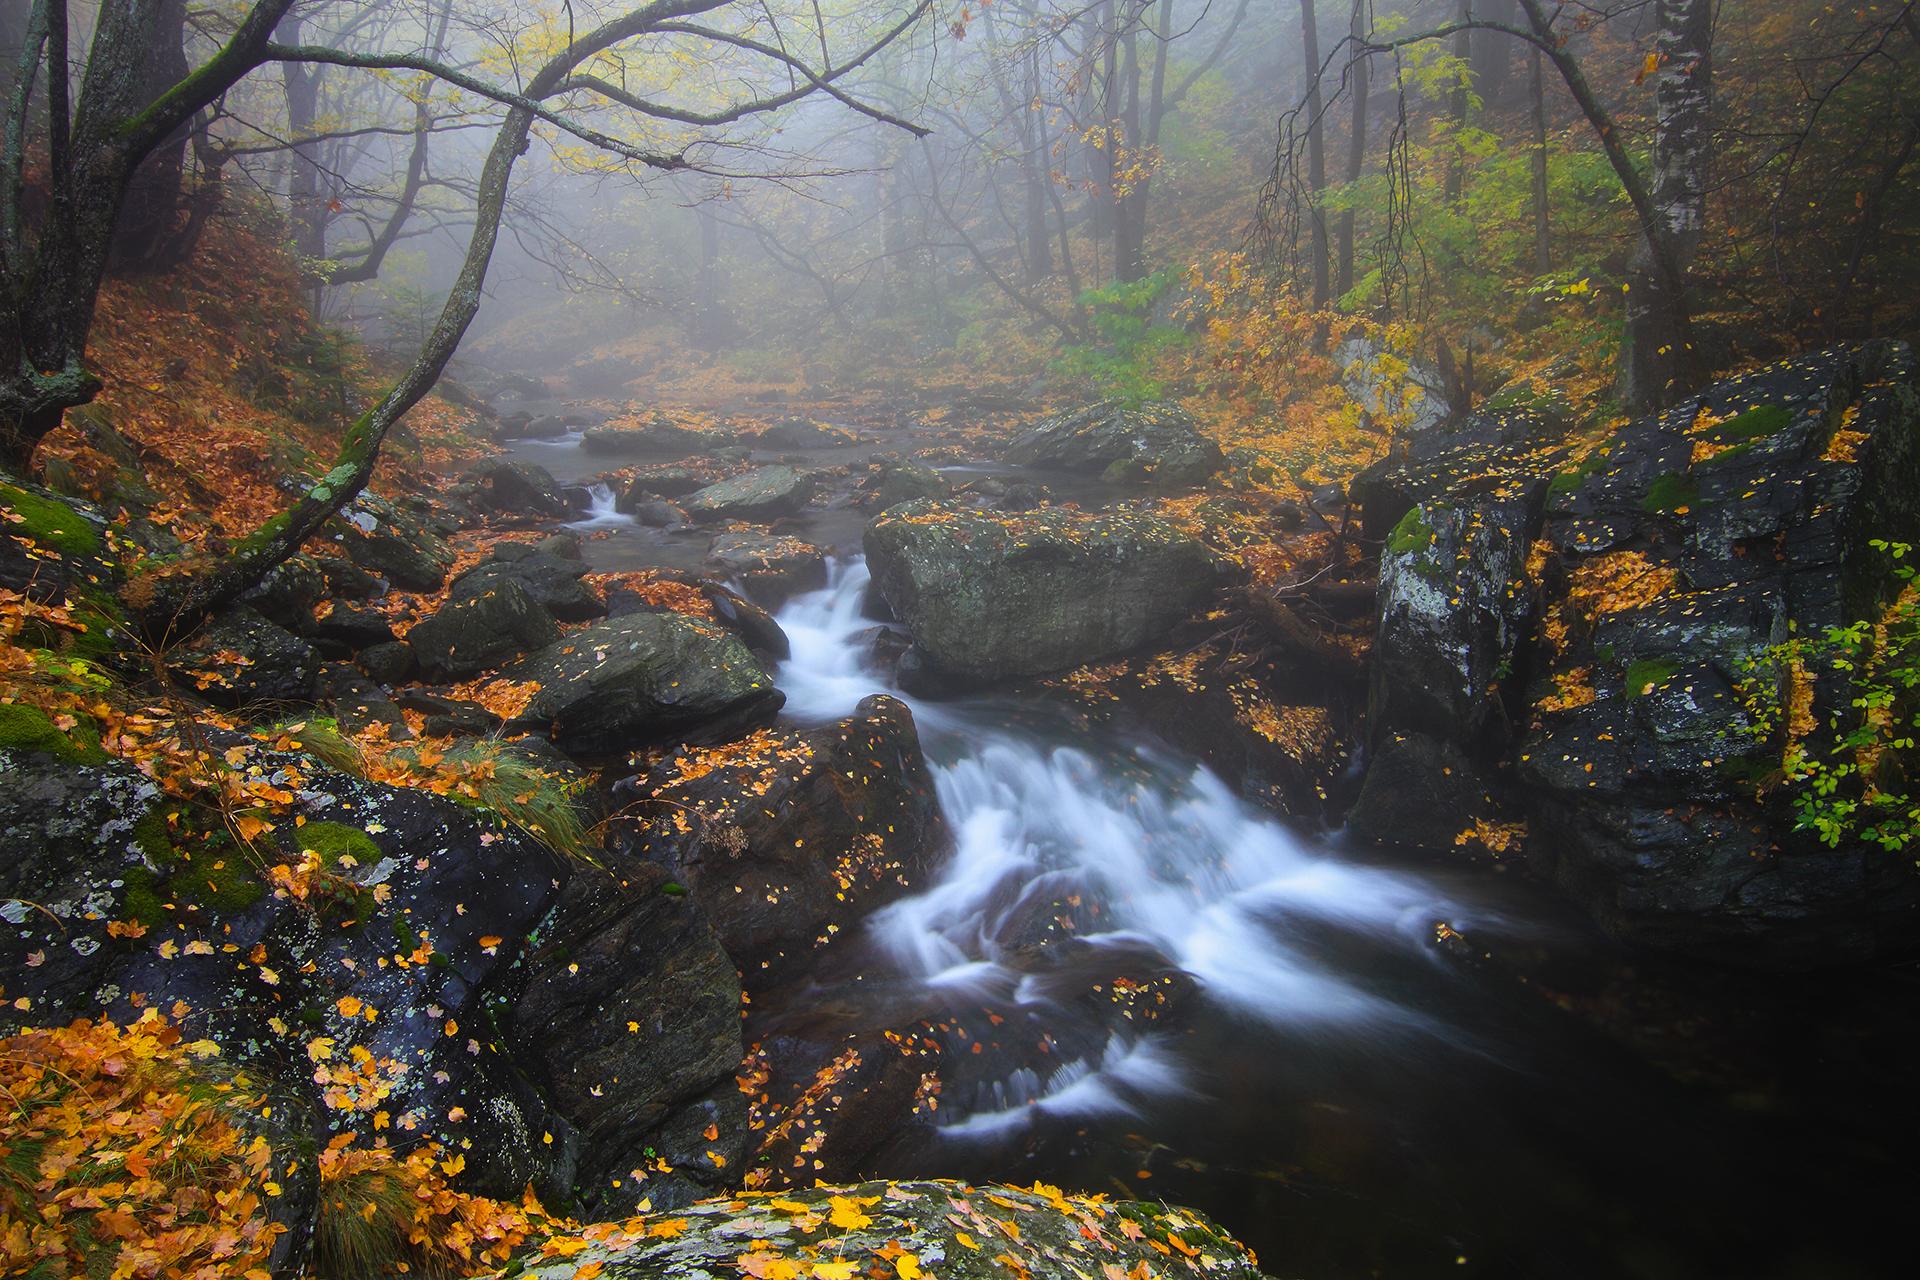 ''С дъх на есен и мъгла'' от емилиян евдокимов - evdokimov_emo